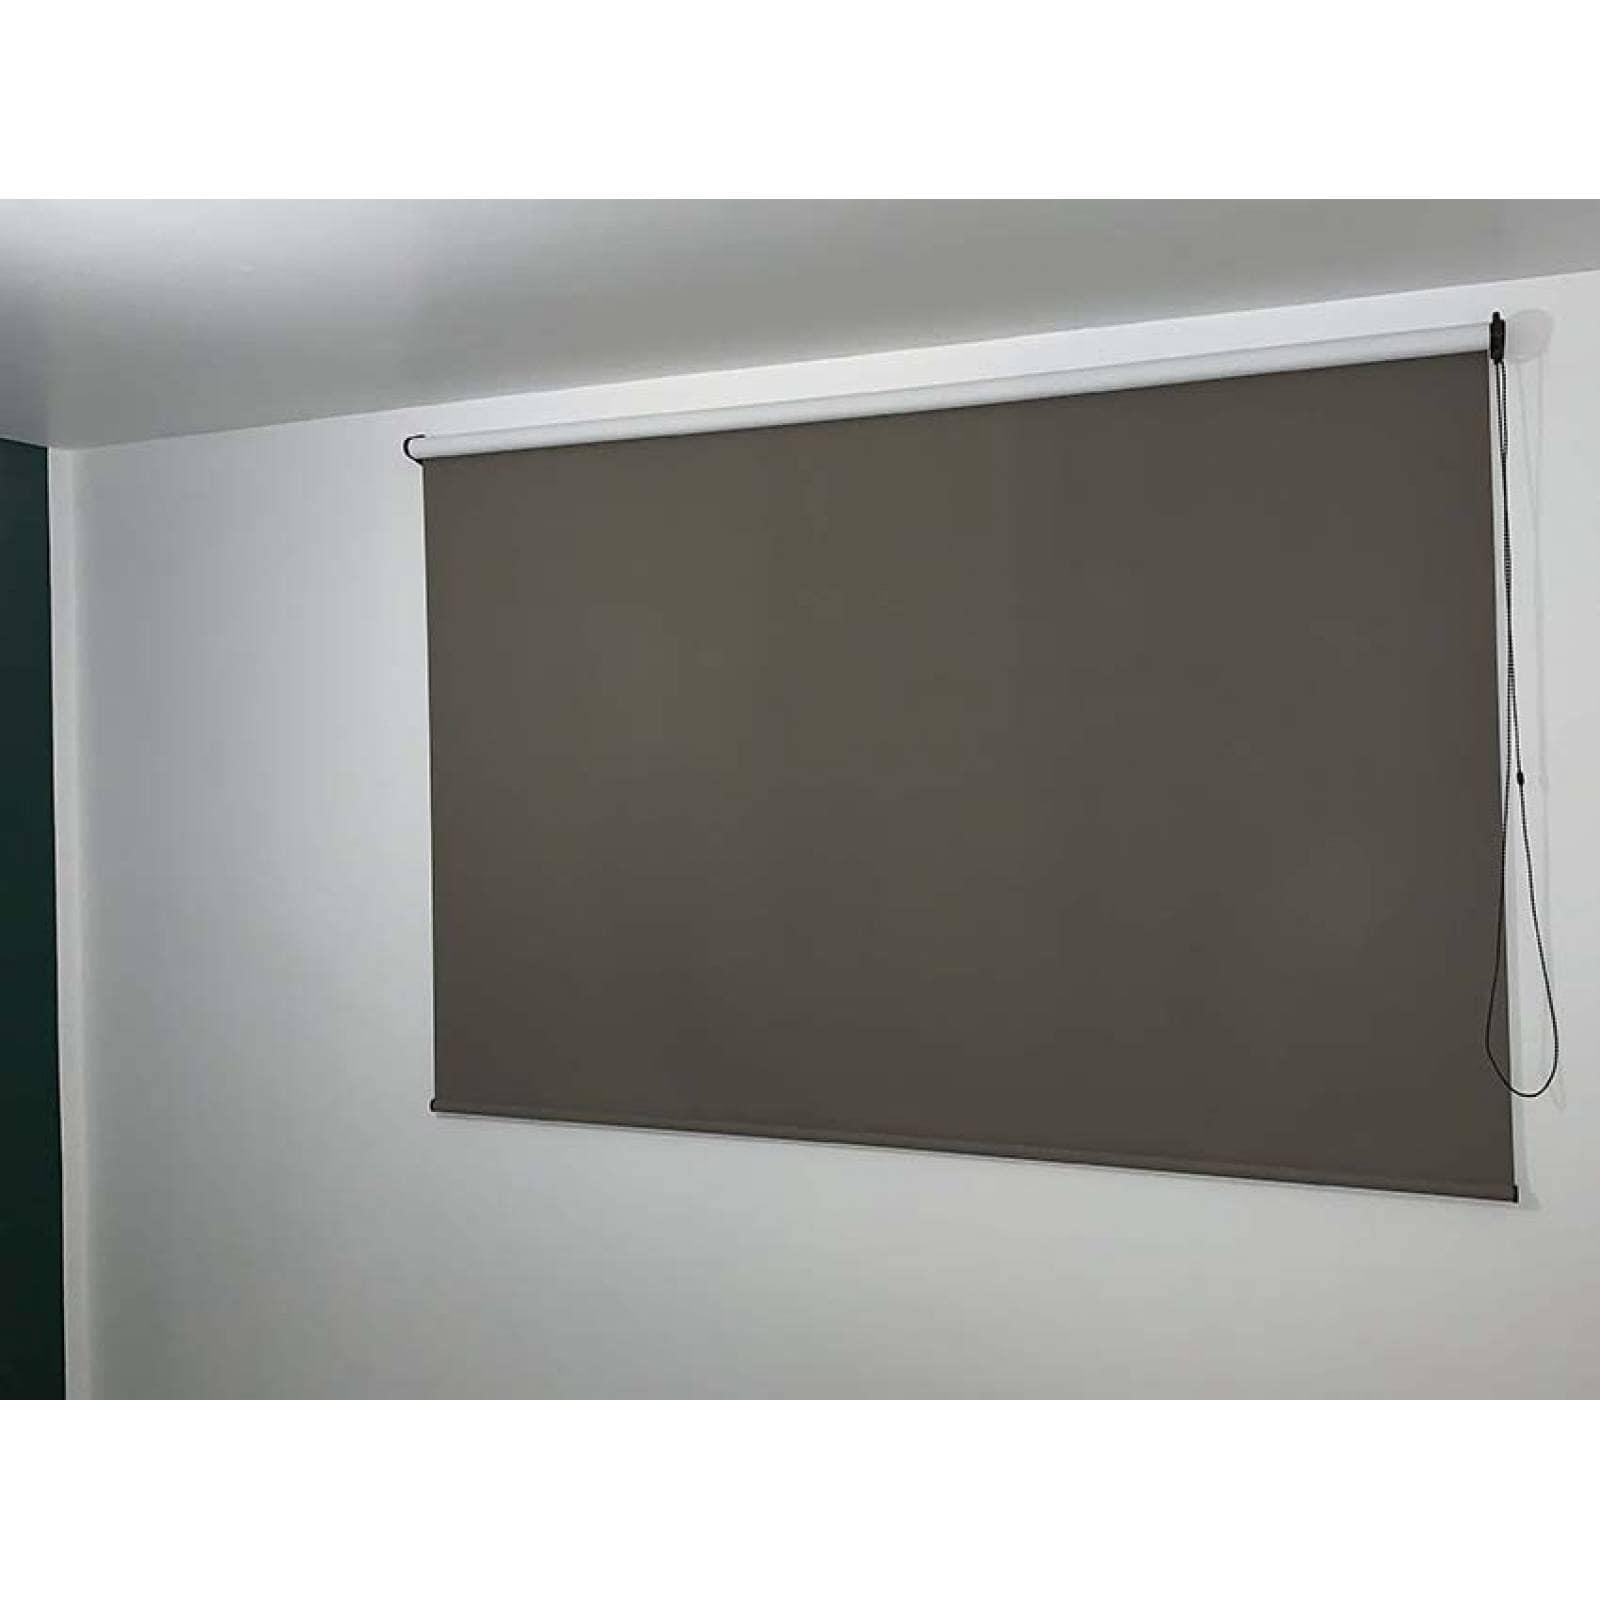 Persianas Blackout modelo Budelli 100 cm de ancho X hasta 100 cm de largo